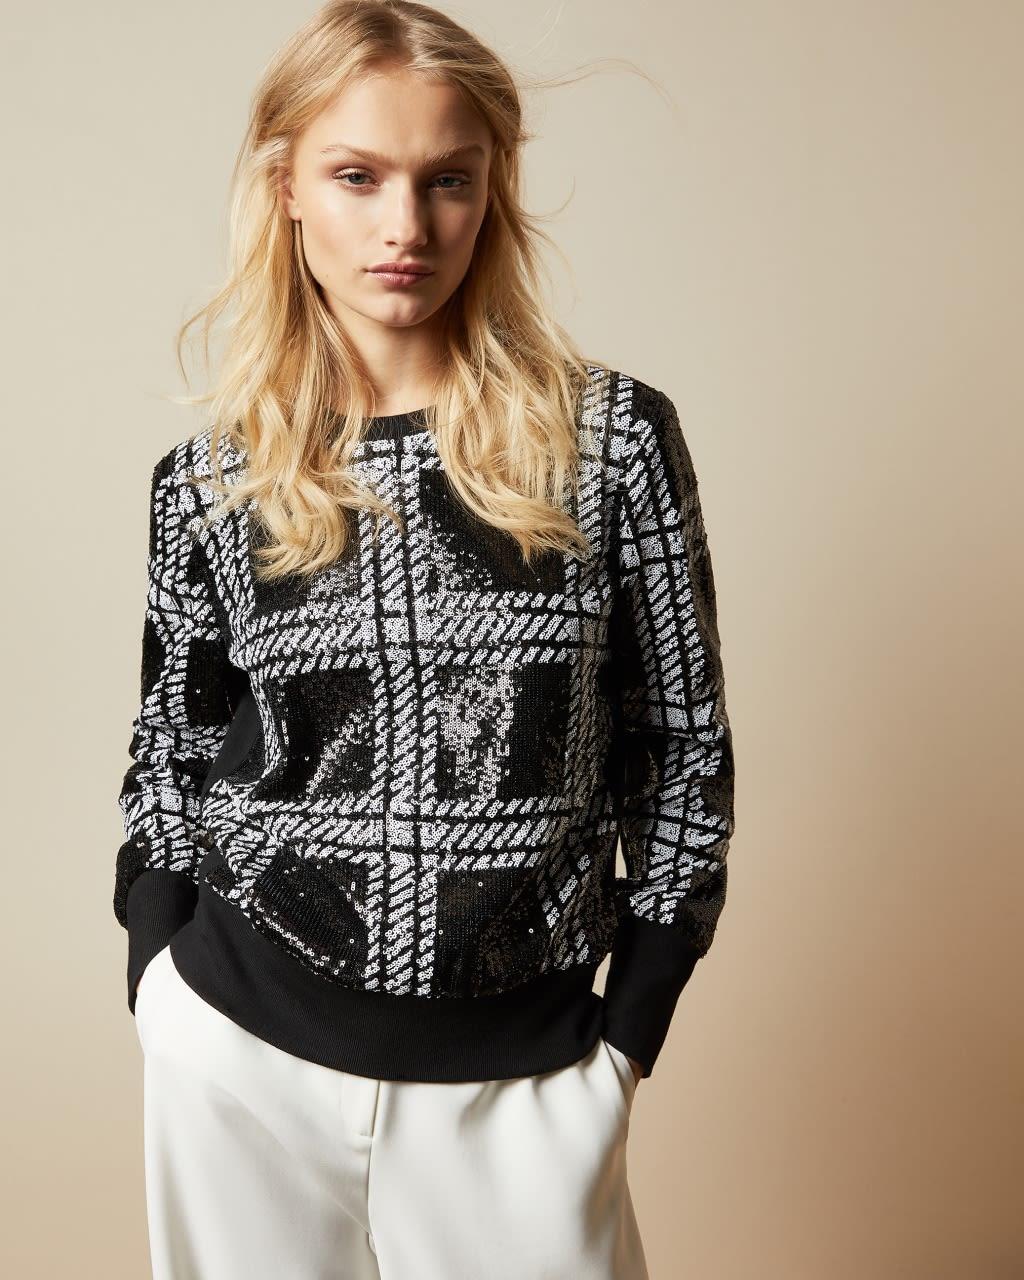 Ted Baker Check Sequin Sweatshirt  - Black - Size:  5 (UK 16)